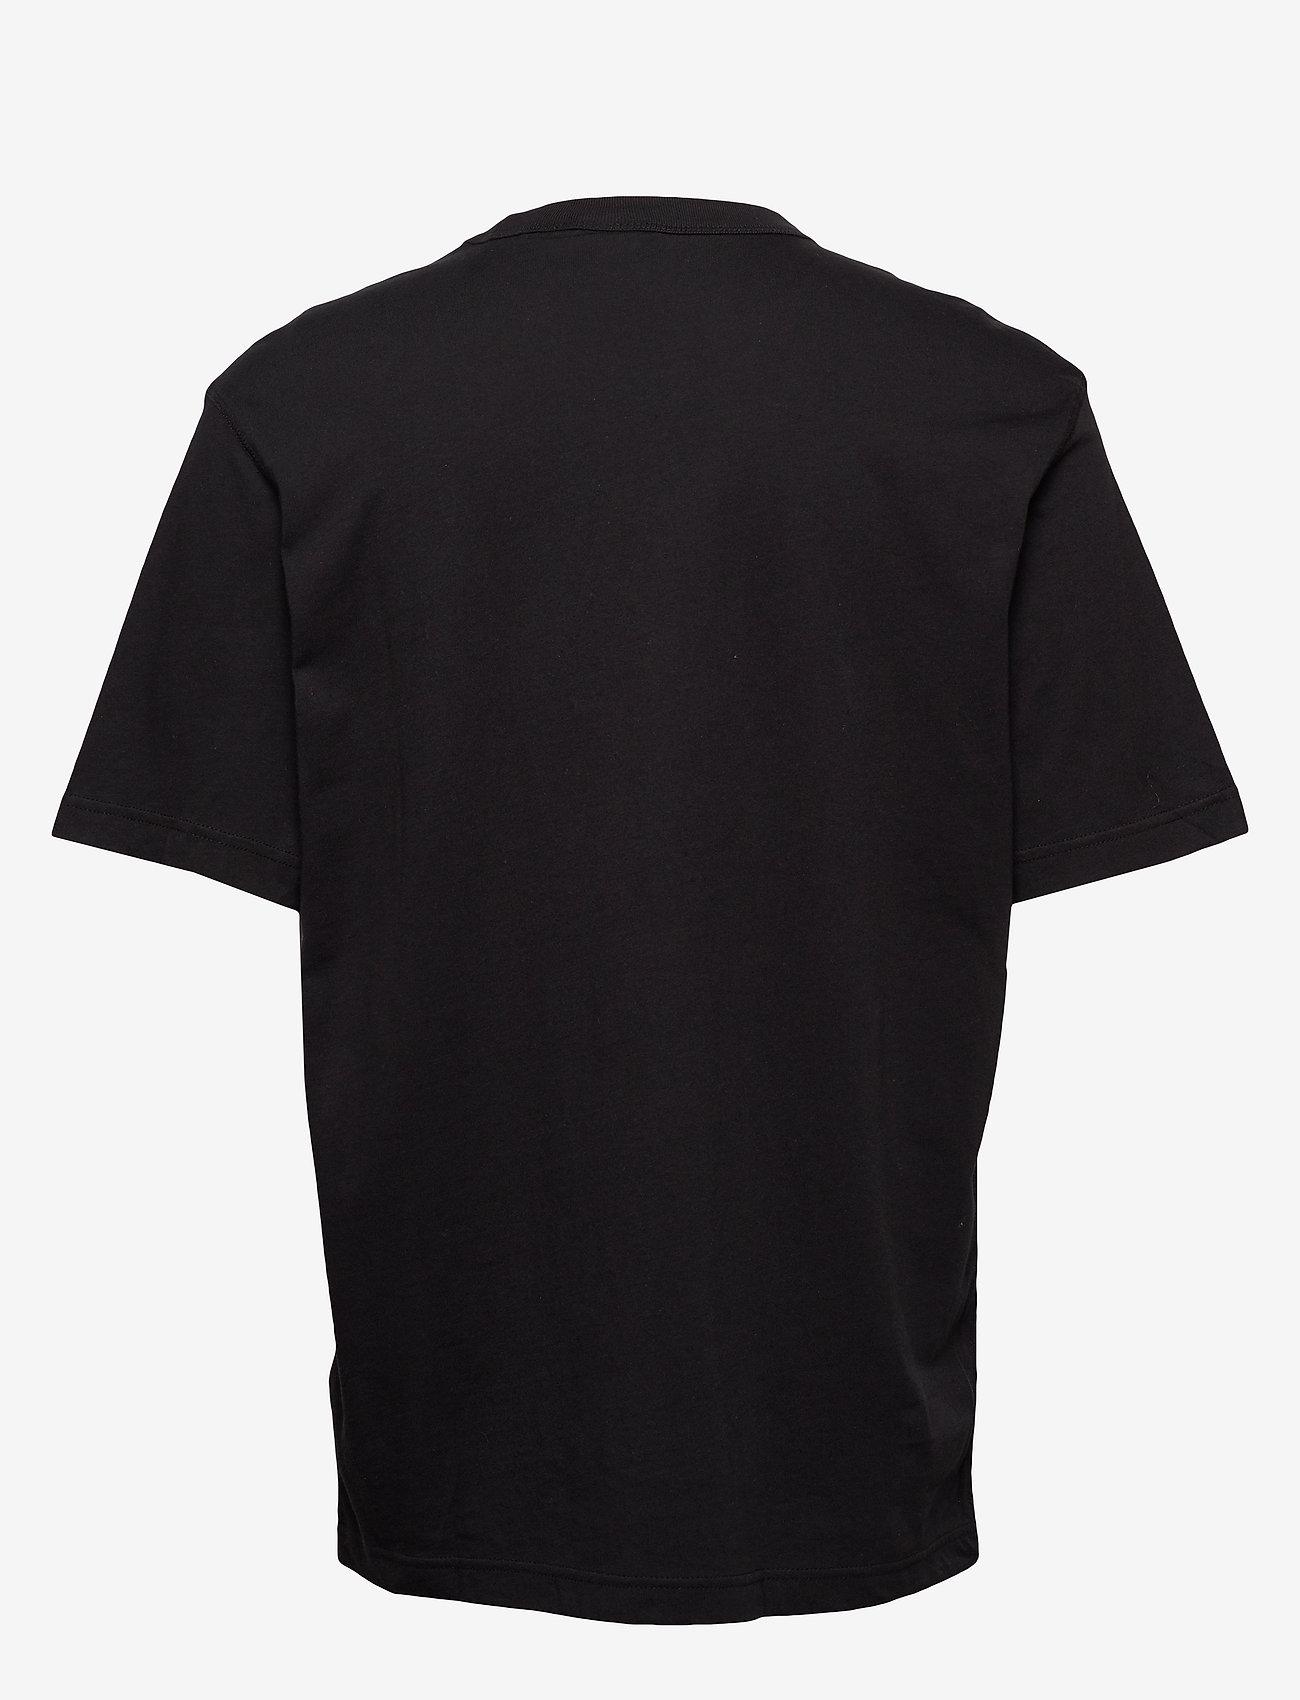 adidas Originals F TEE - T-skjorter BLACK - Menn Klær